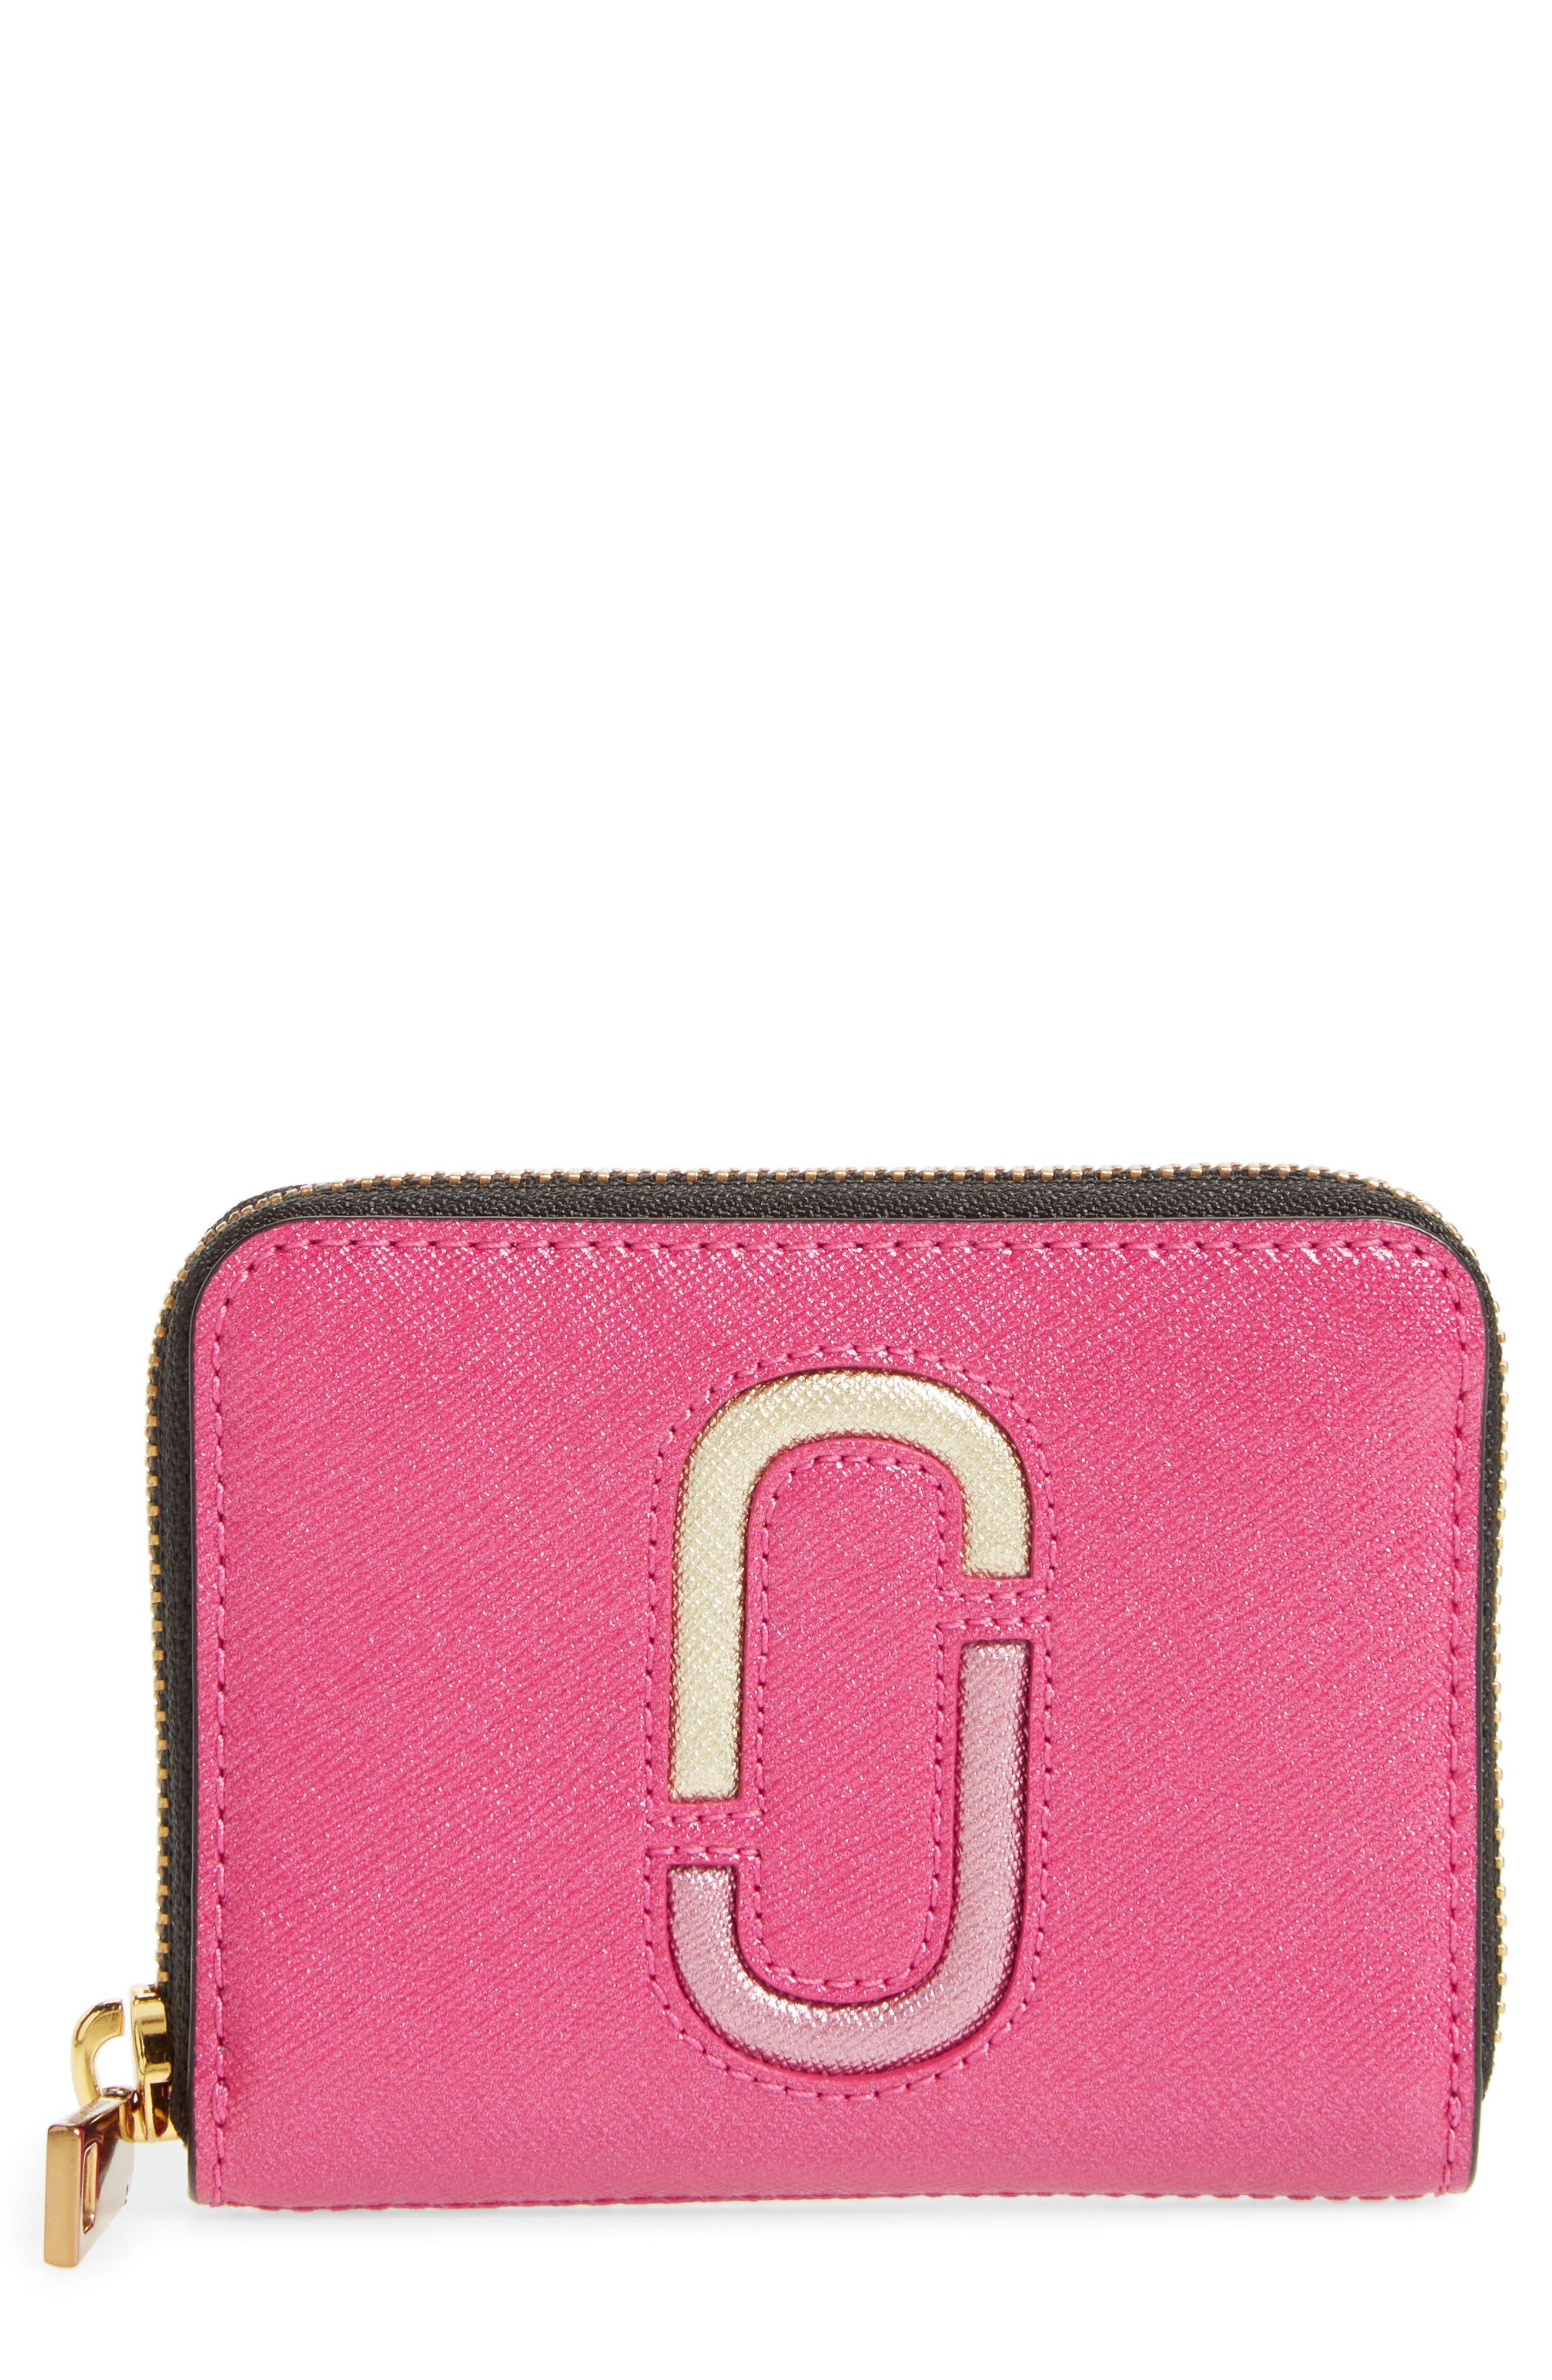 Main Image - MARC JACOBS Snapshot Saffiano Leather Zip Around Wallet